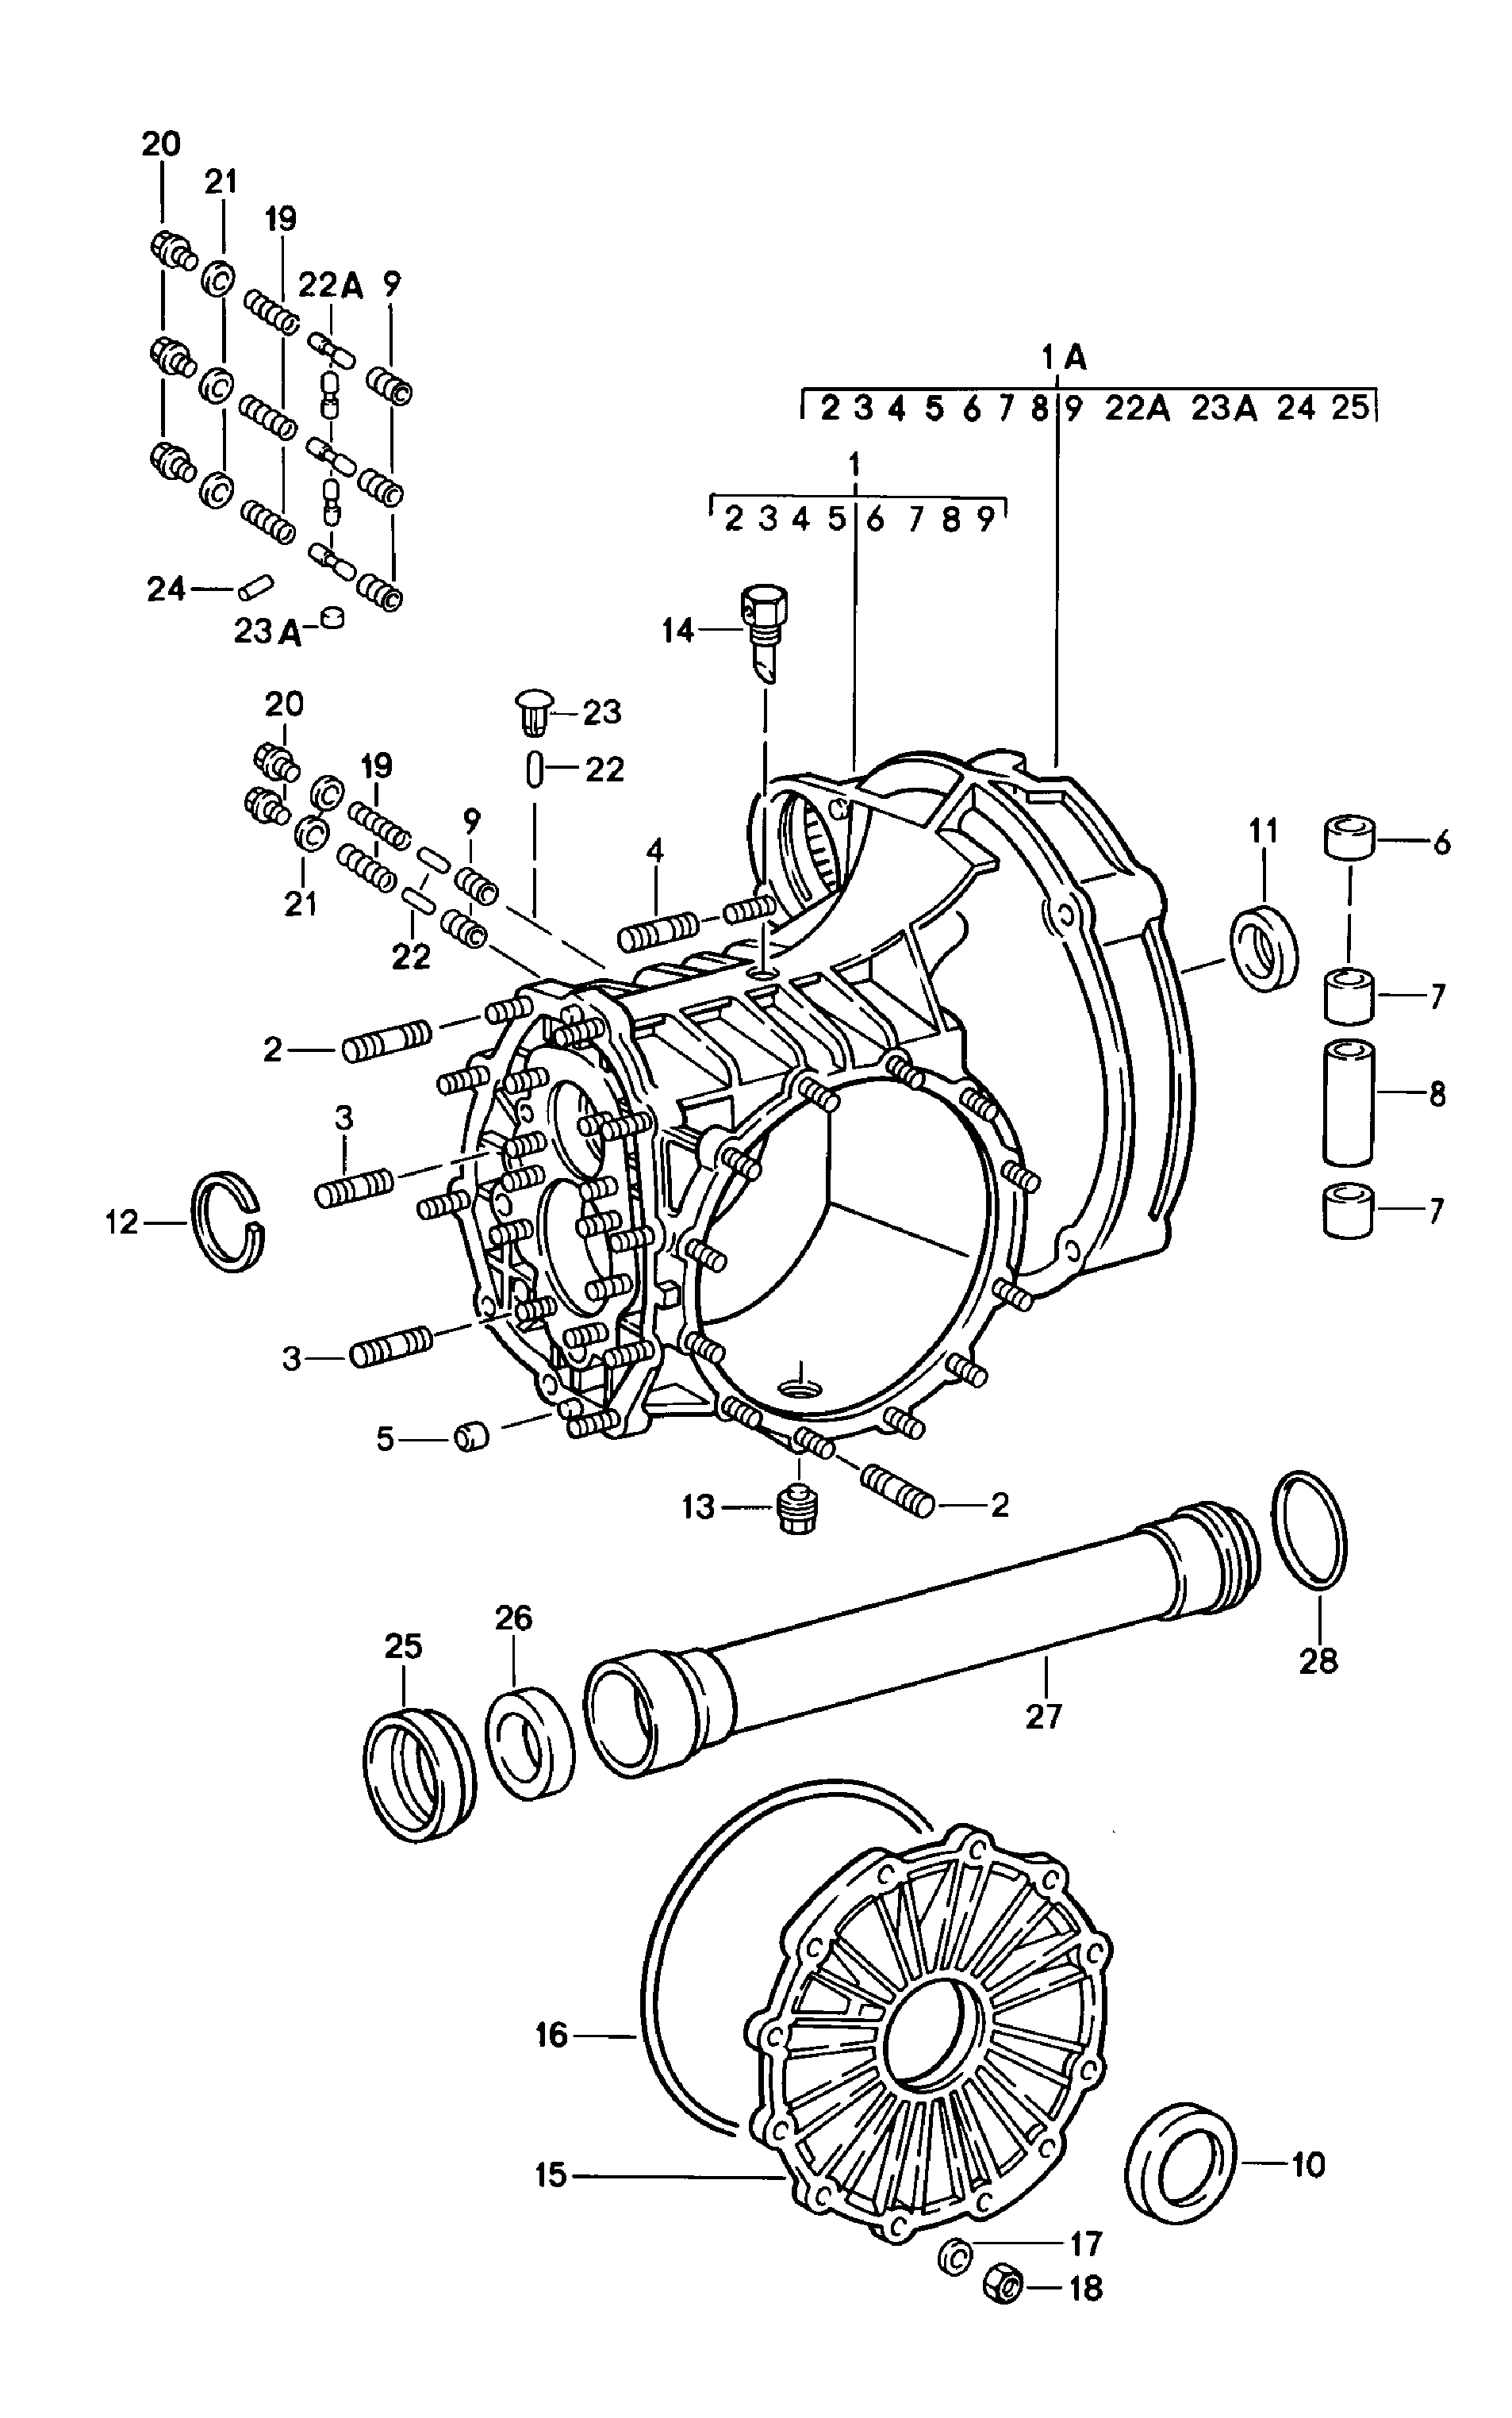 Porsche 901 Transmission Diagram Schematic Diagrams 911 1978 1983 Case Replacement Linkage